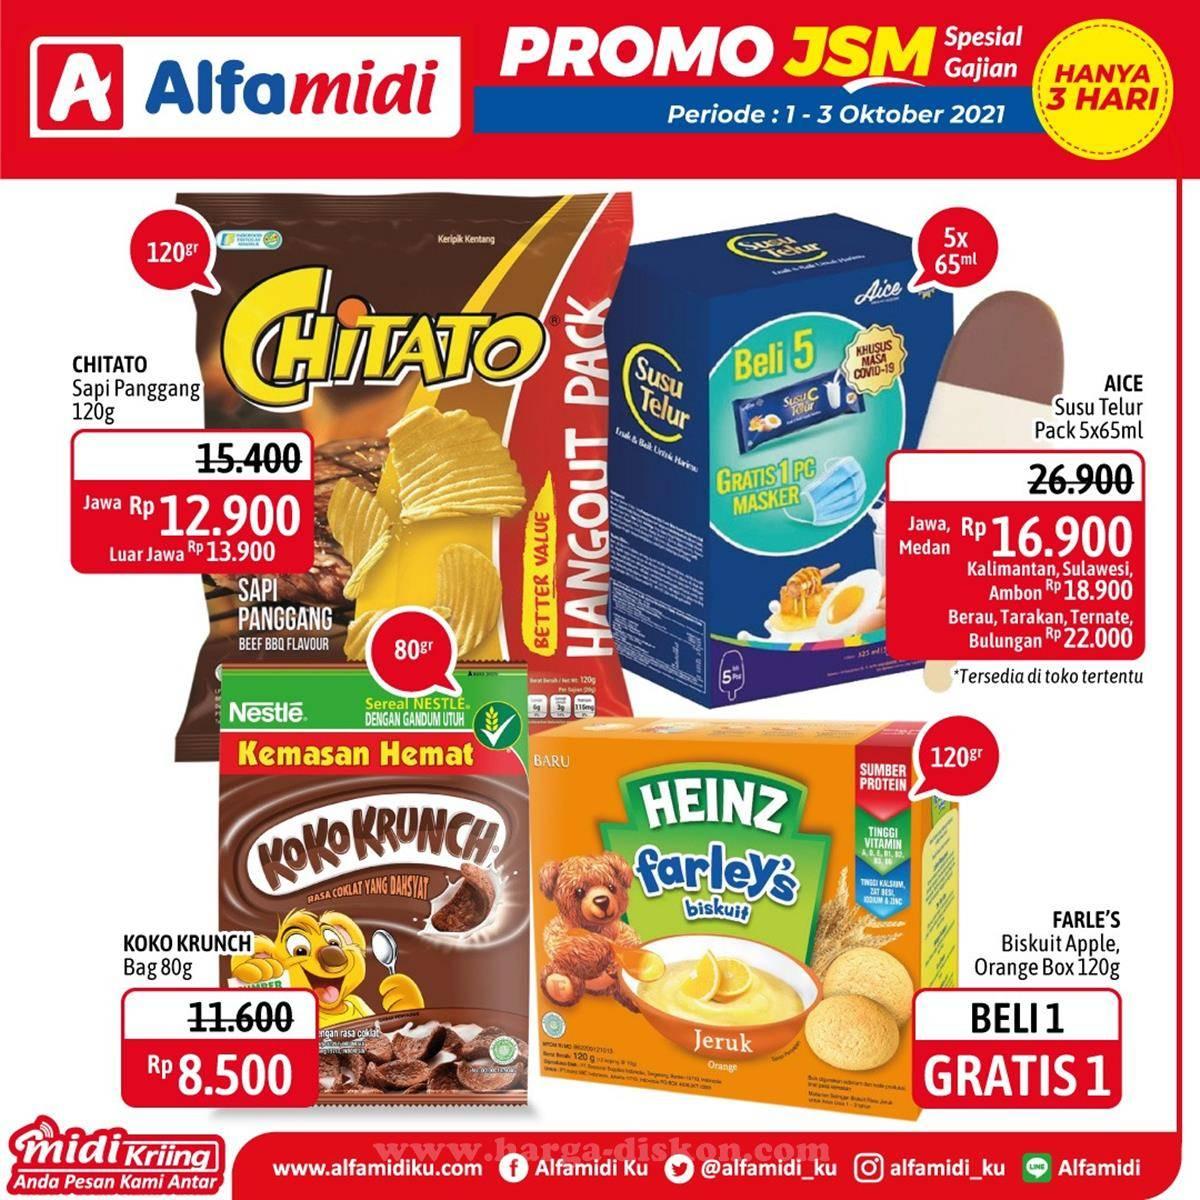 Promo diskon Promo ALFAMIDI Akhir Pekan Weekend JSM Periode 1-3 Oktober 2021